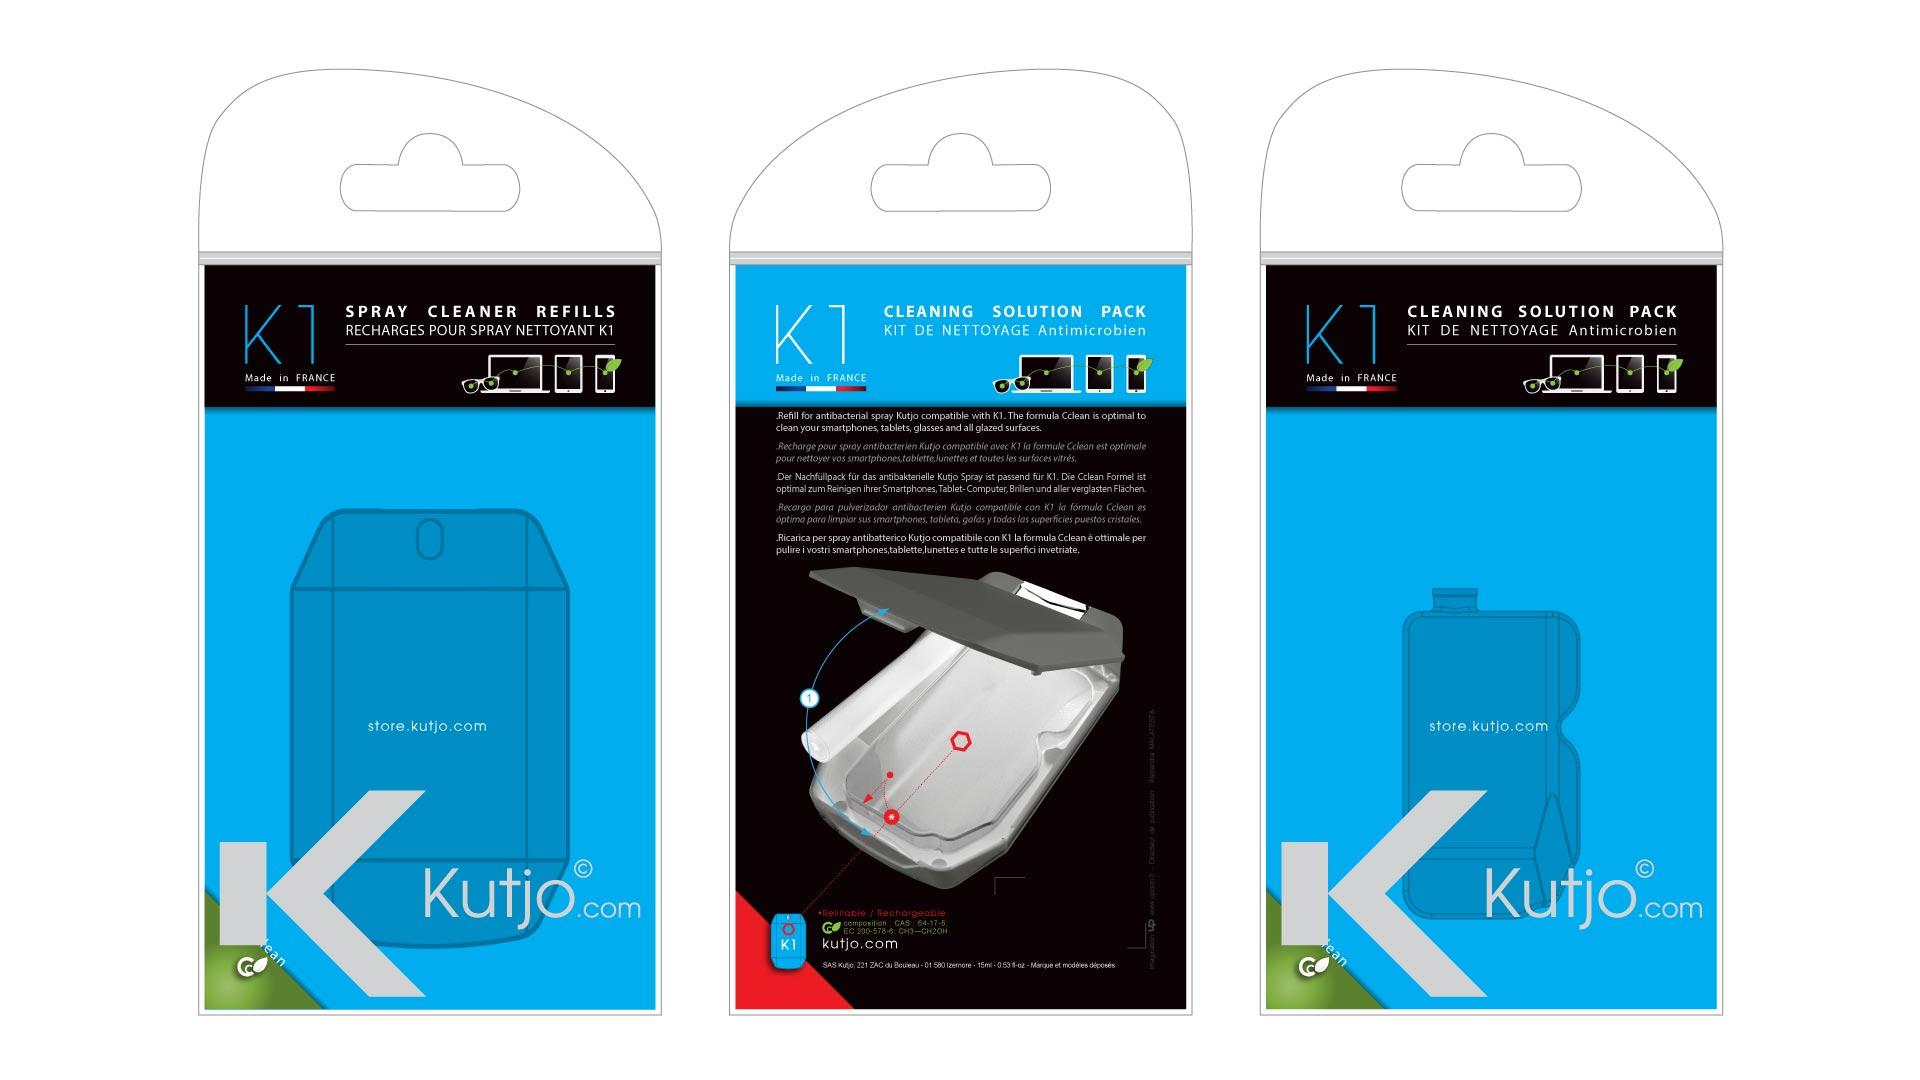 kutjo packaging